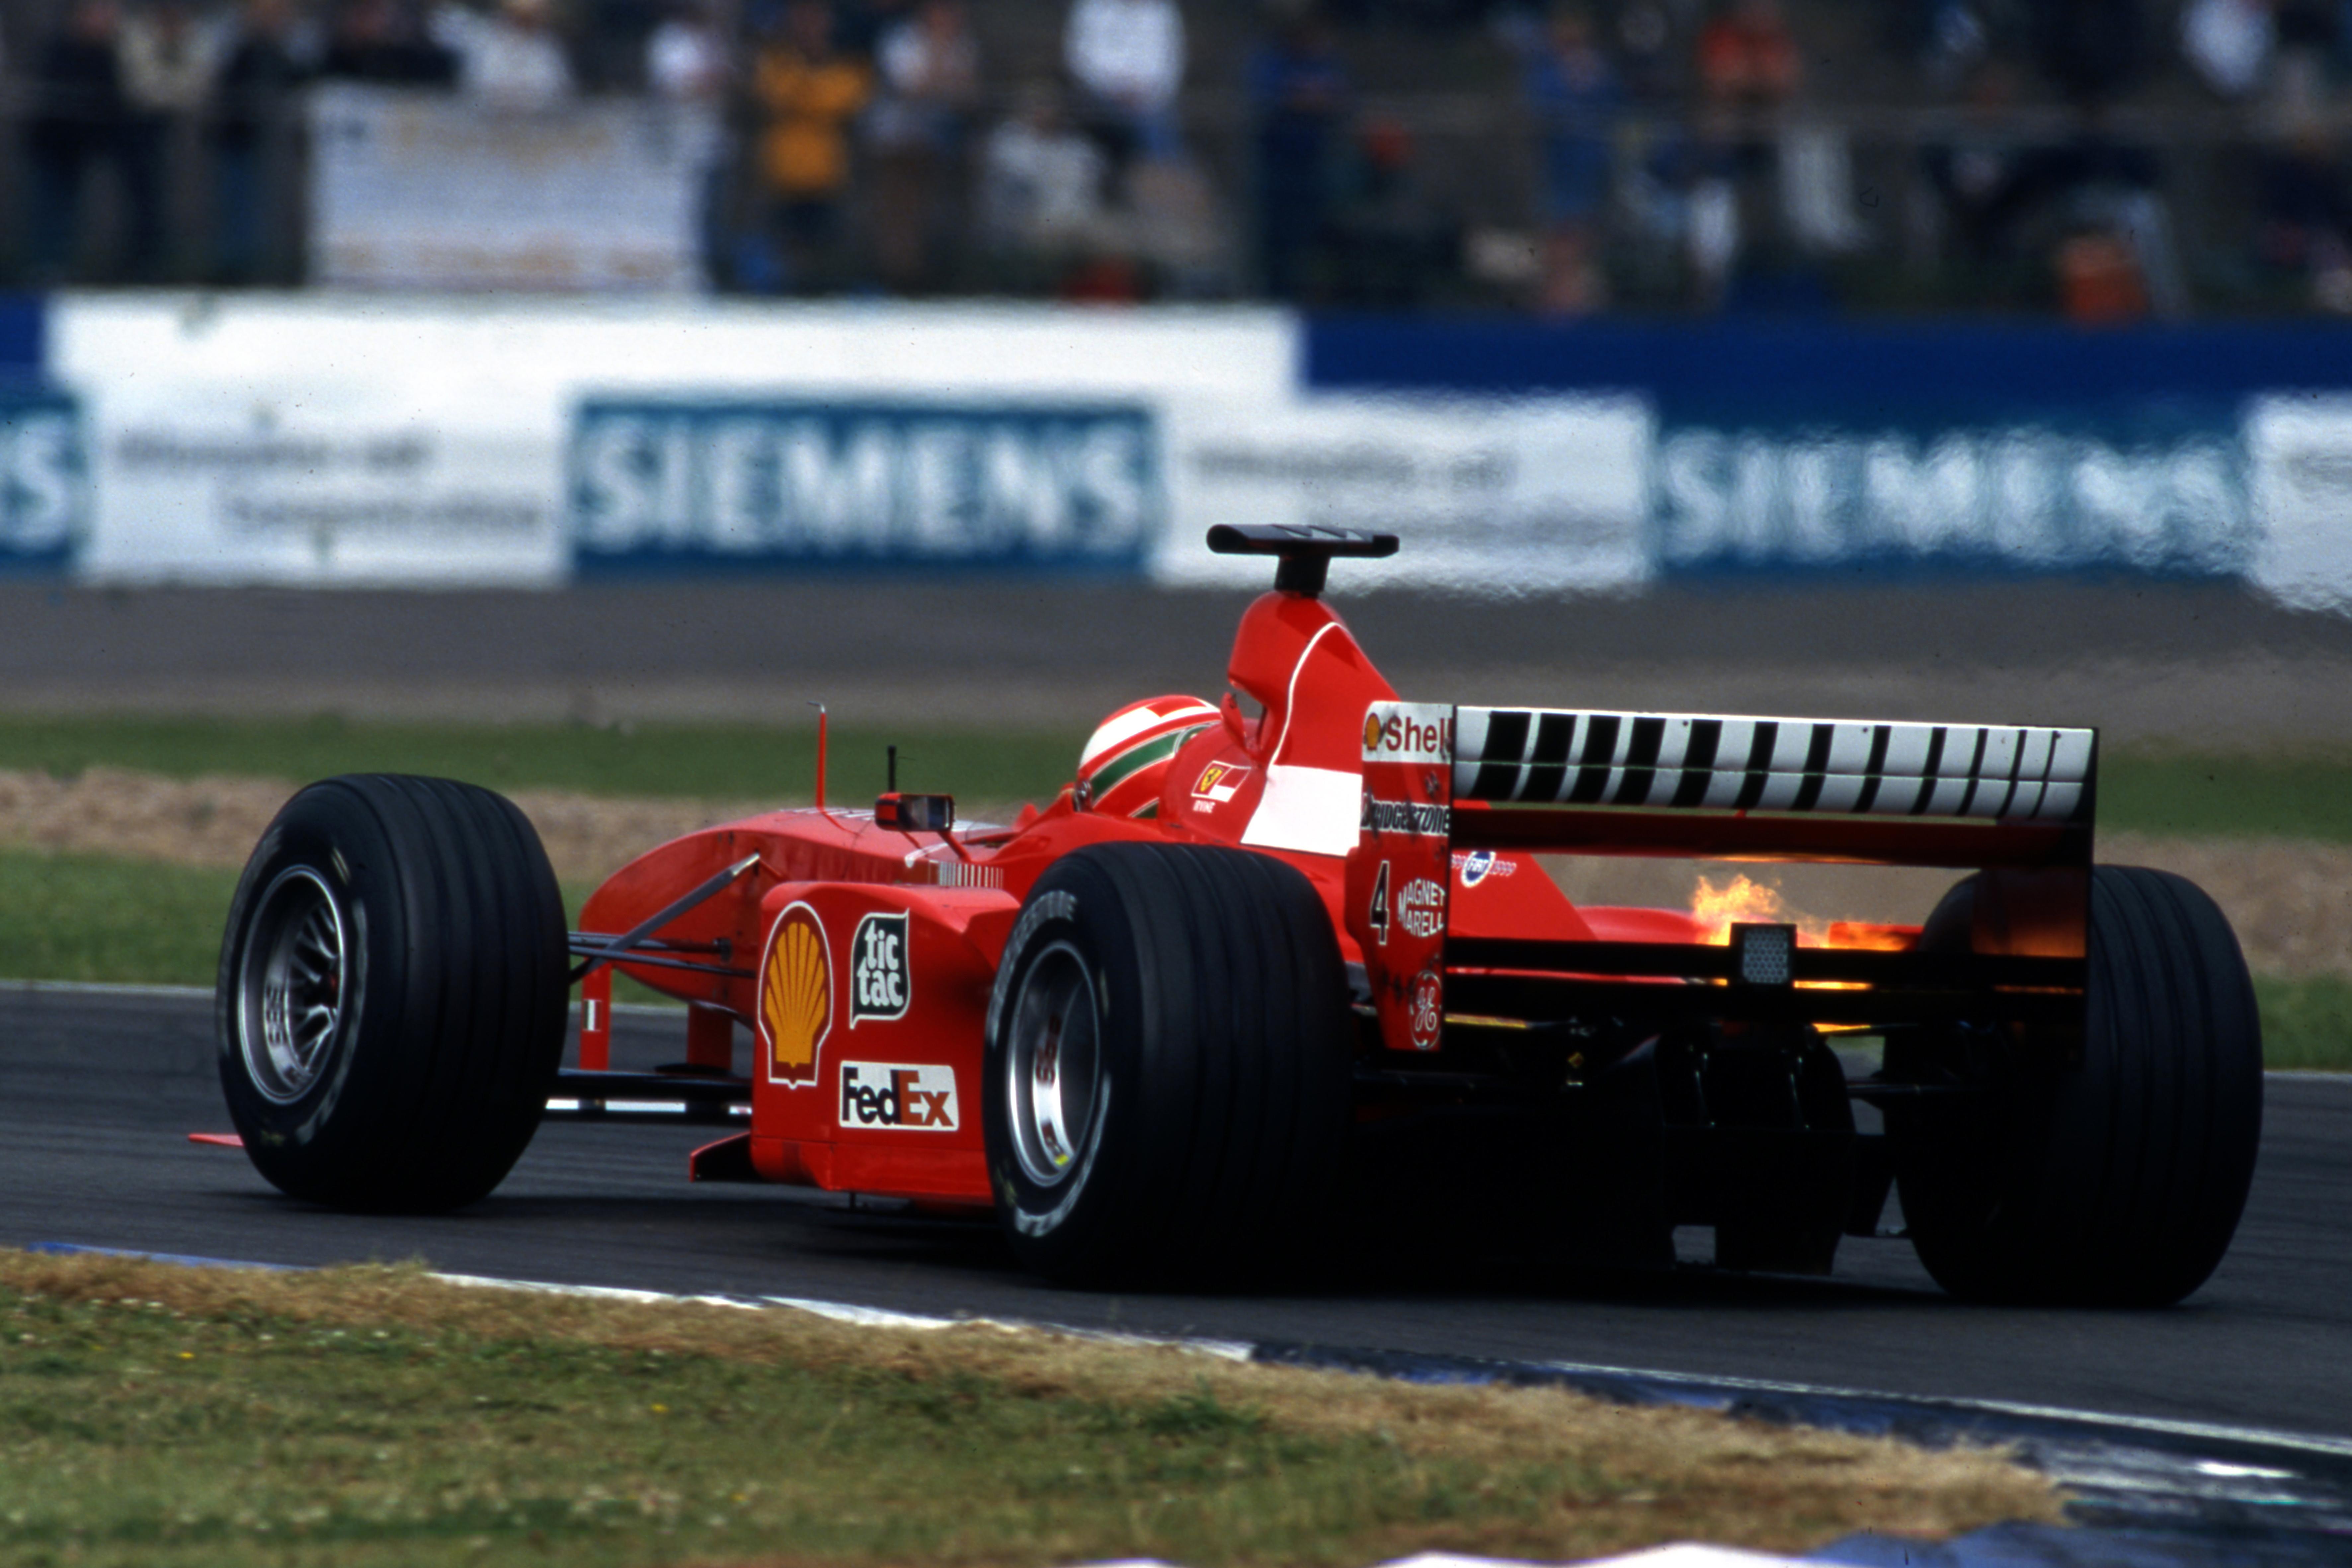 Eddie Irvine Ferrari British Grand Prix 1999 Silverstone